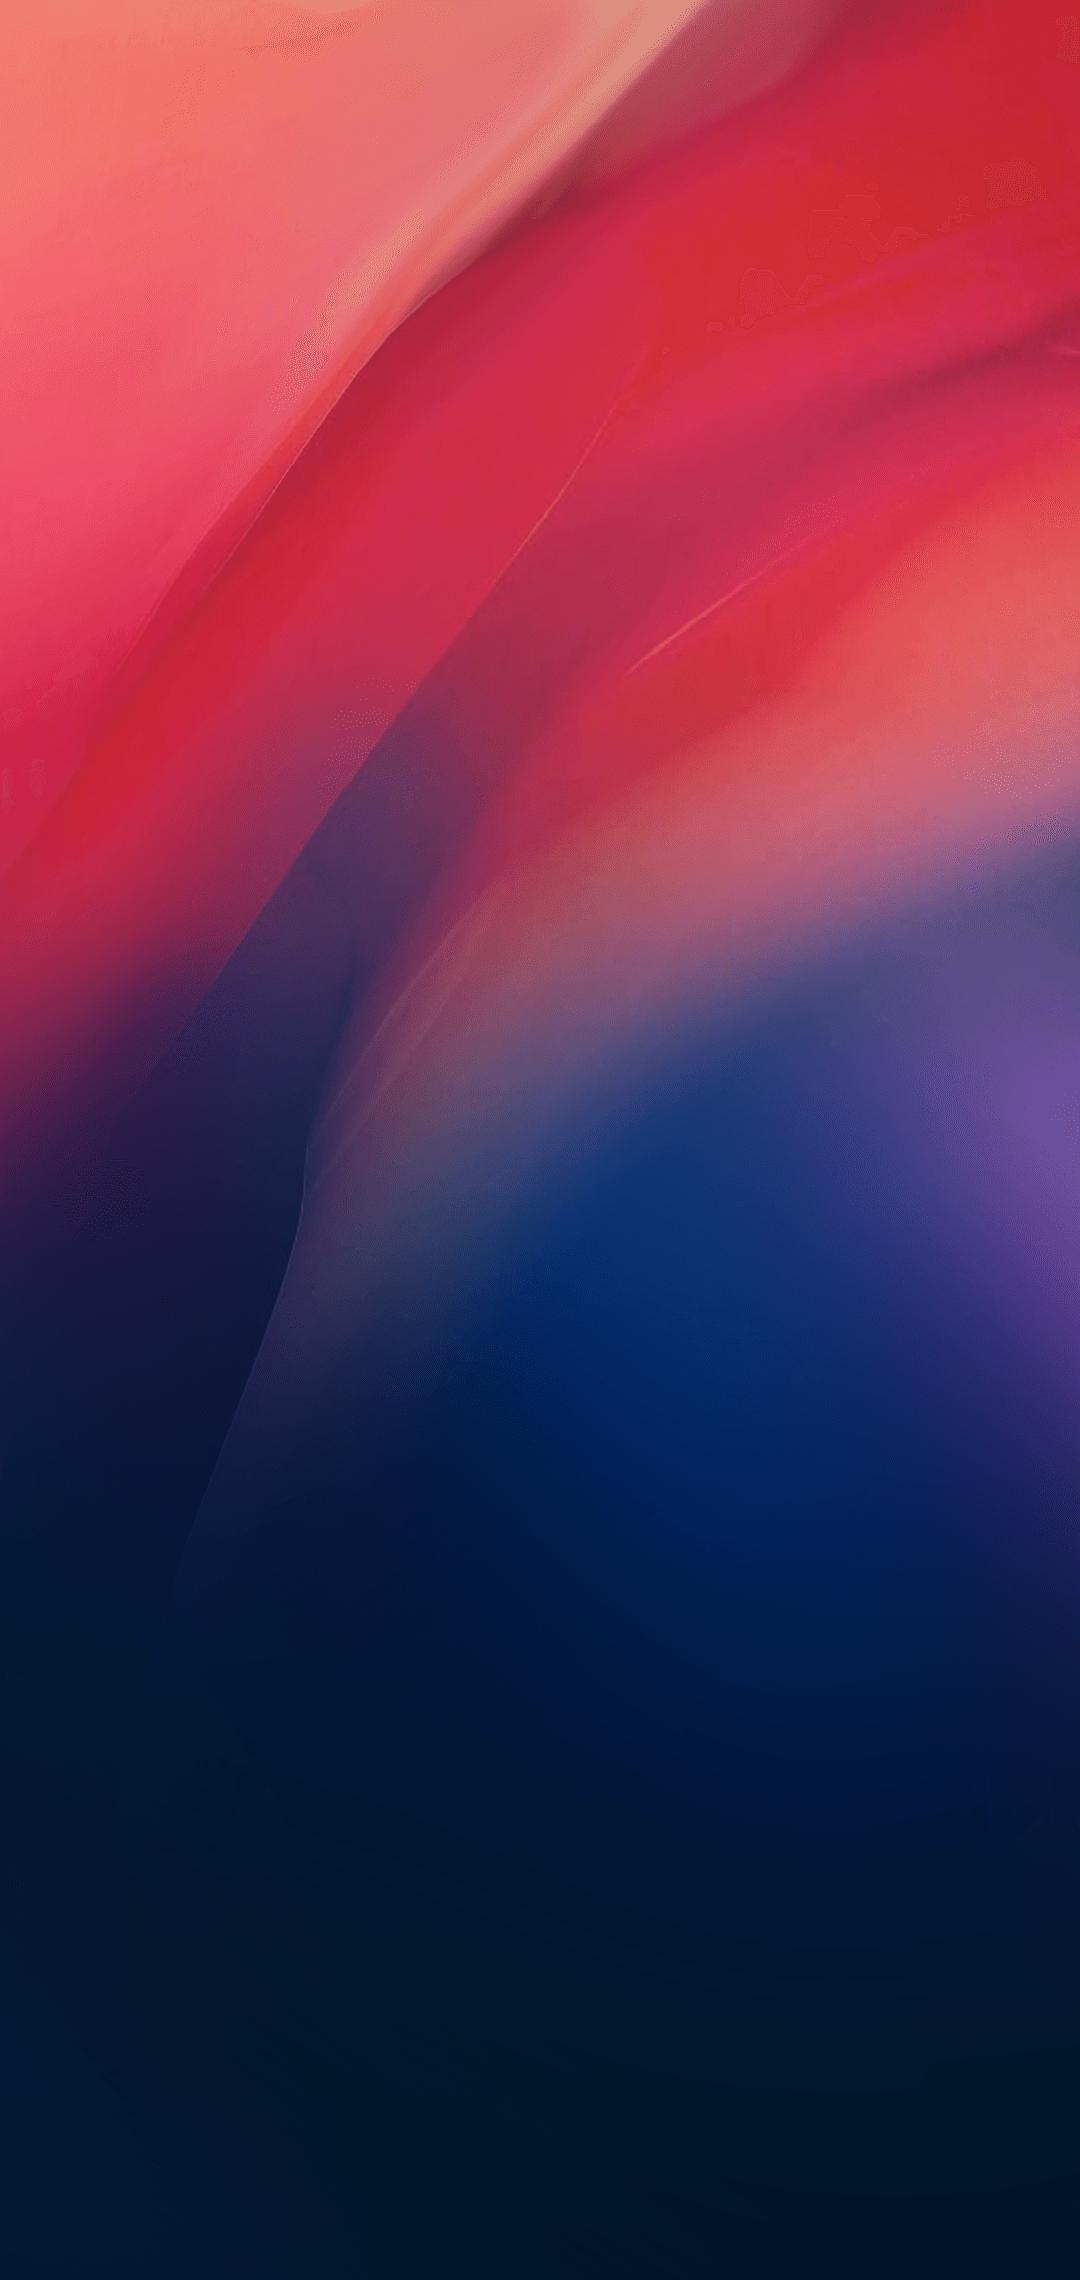 W_White  Xiaomi wallpapers, Stock wallpaper, Iphone wallpaper fall